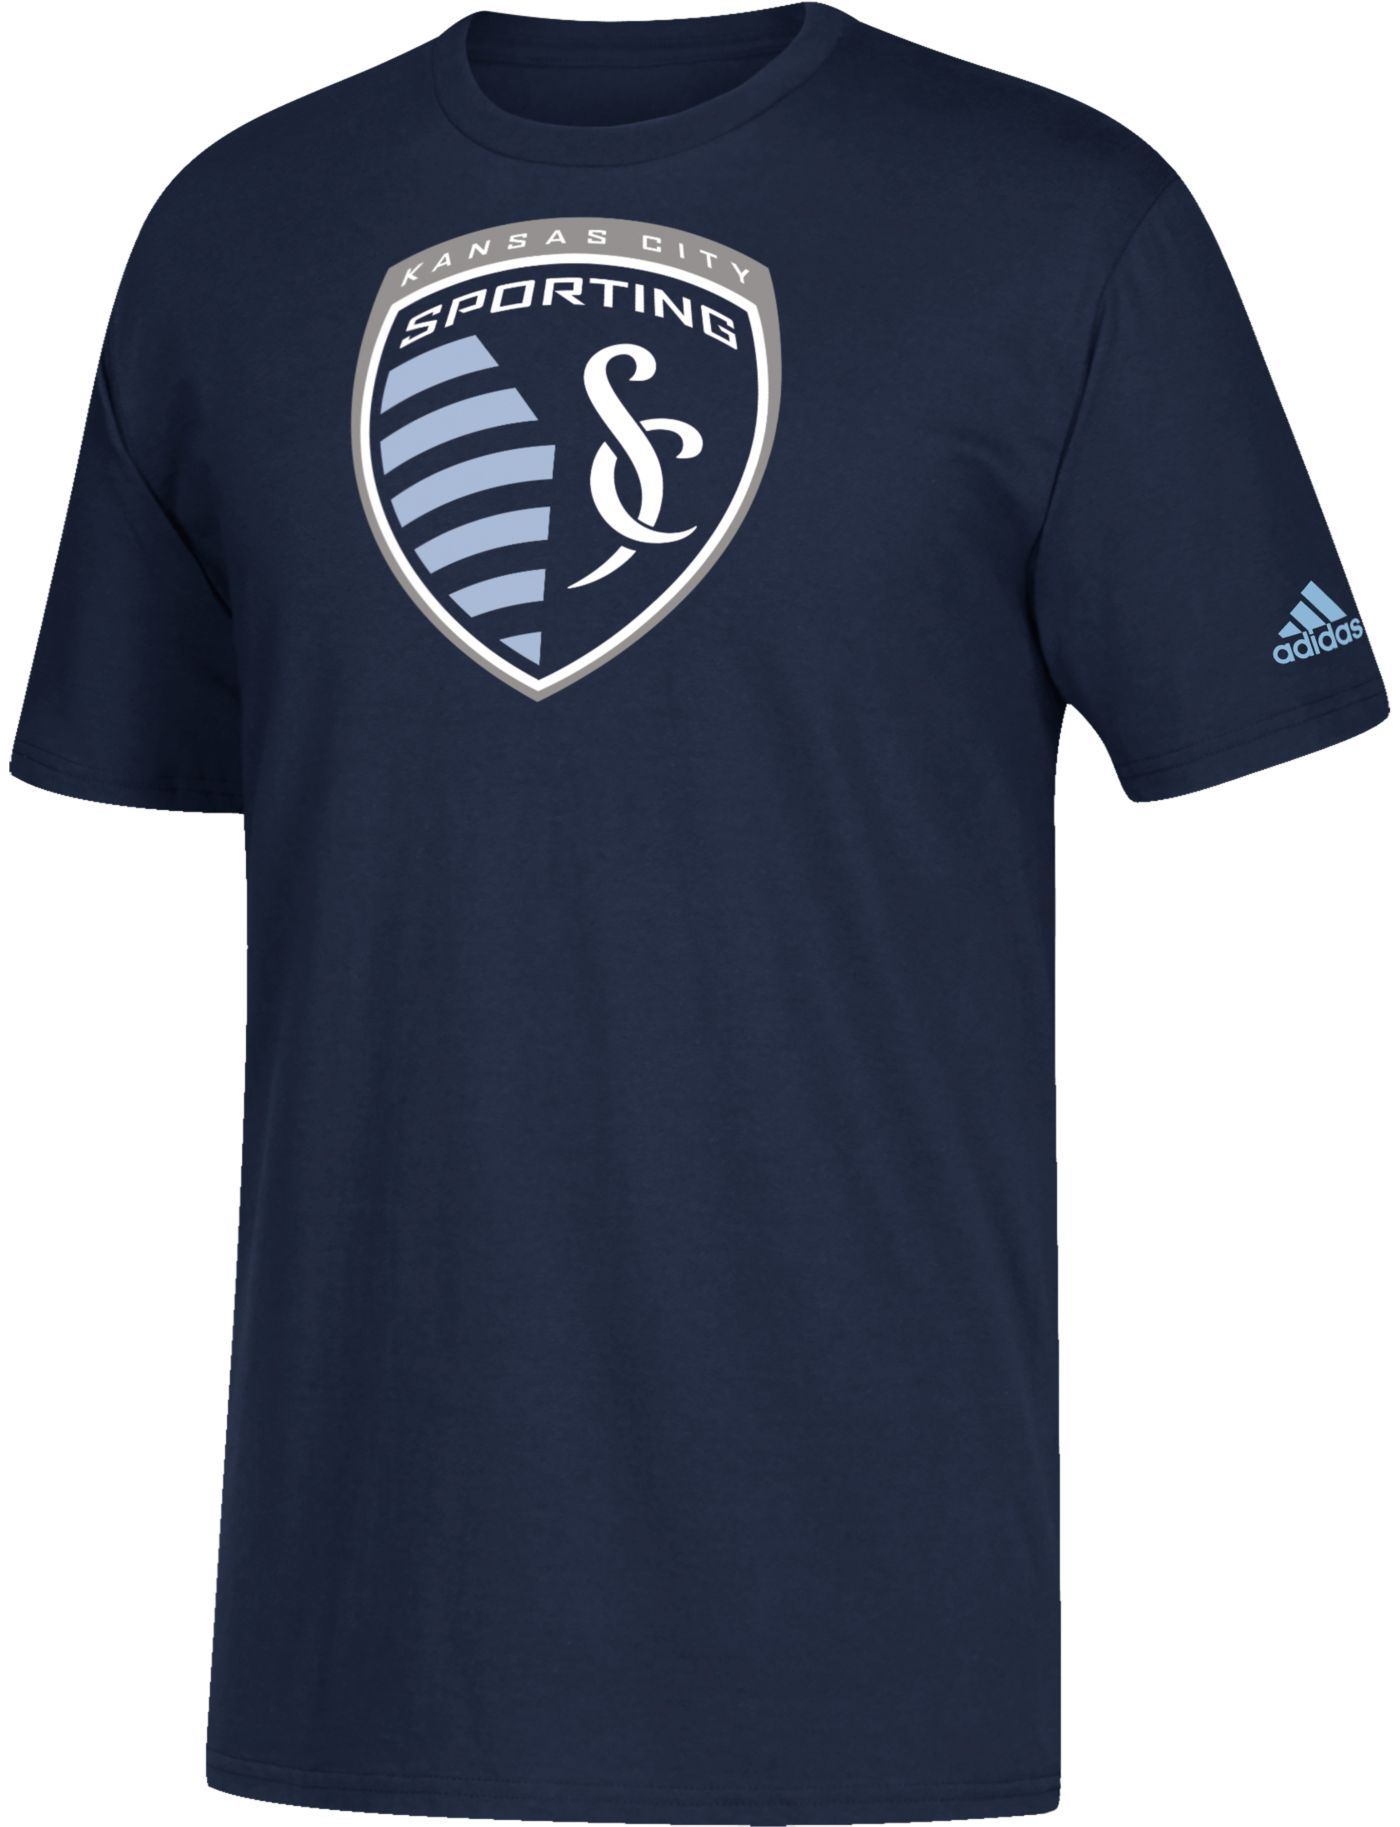 adidas Youth Sporting Kansas City Squad Navy T-Shirt